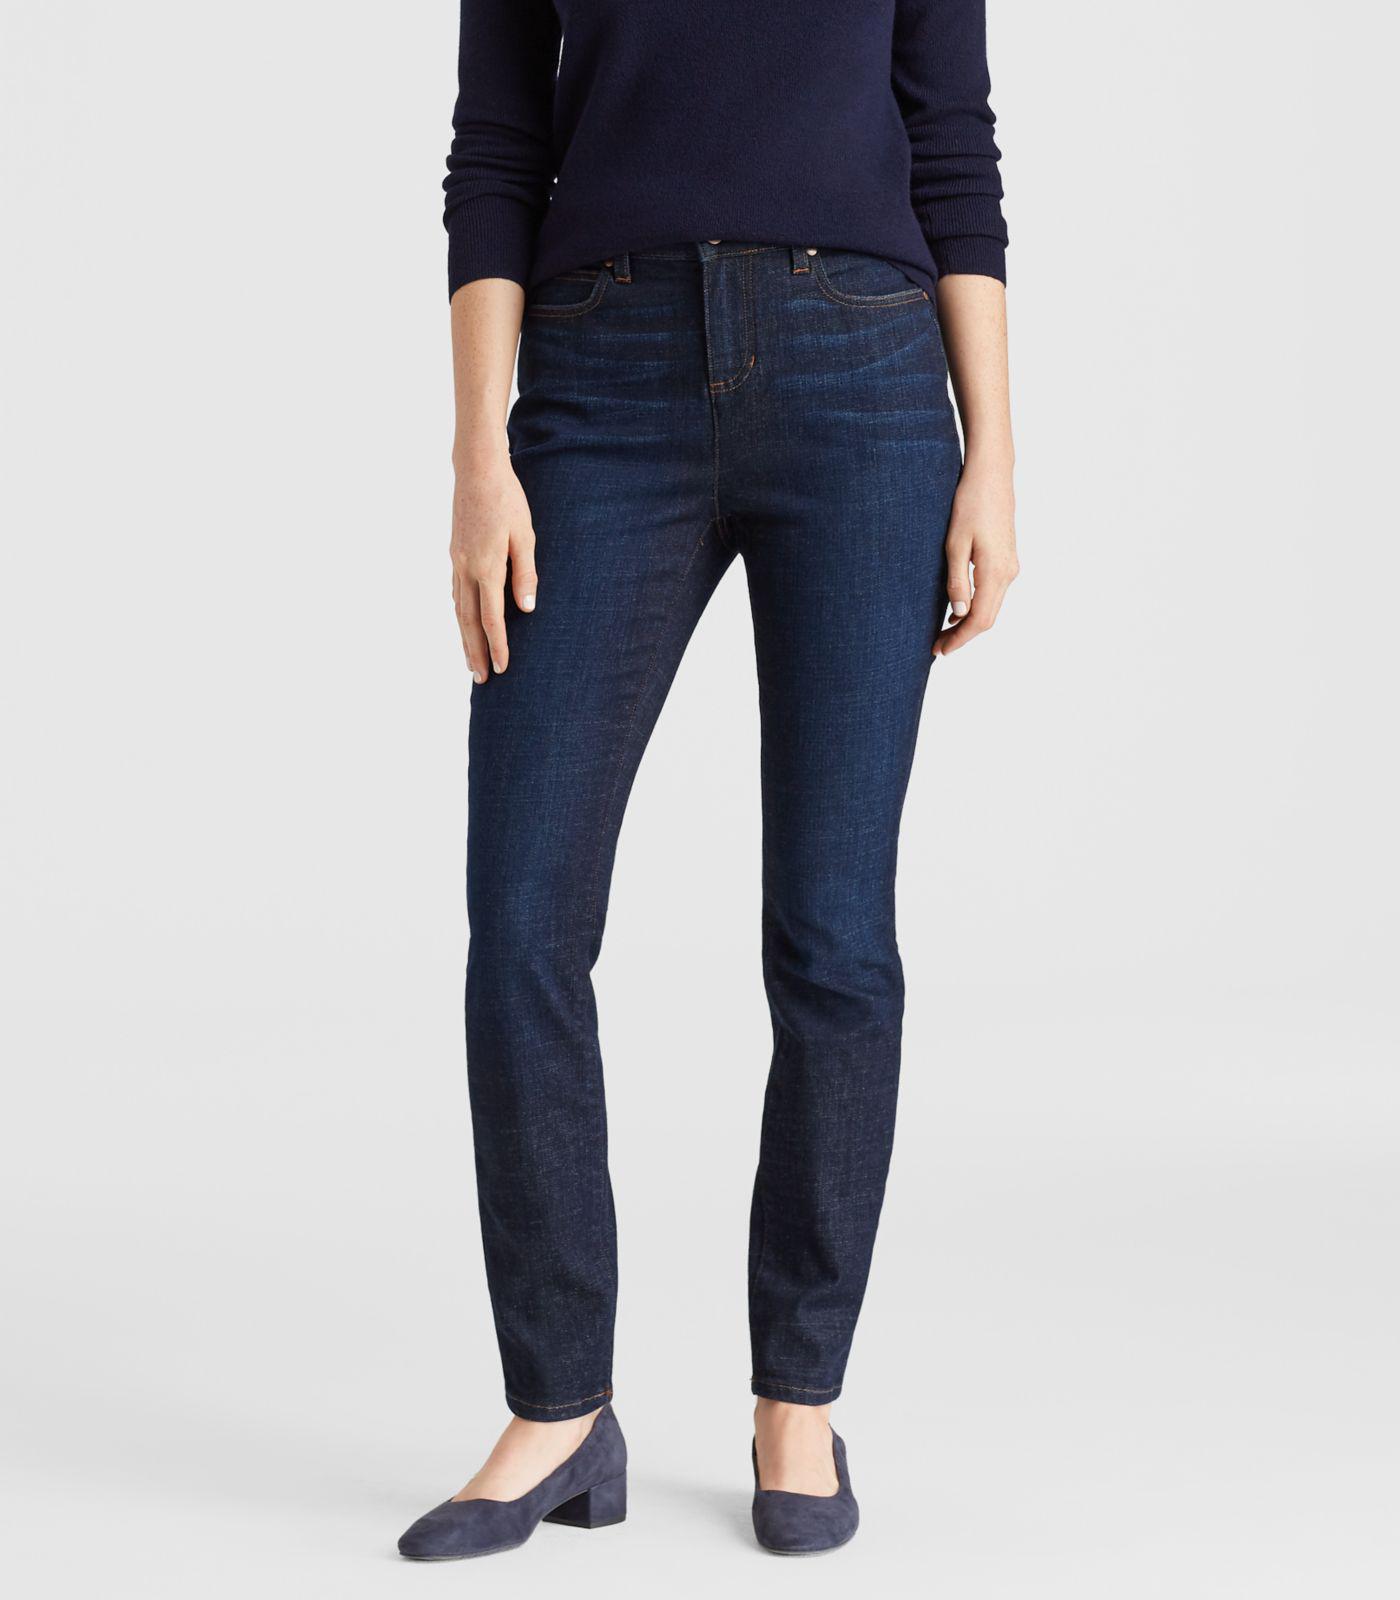 aa8763089b86a Eileen Fisher - Blue Organic Cotton High-waisted Skinny Jean - Lyst. View  fullscreen